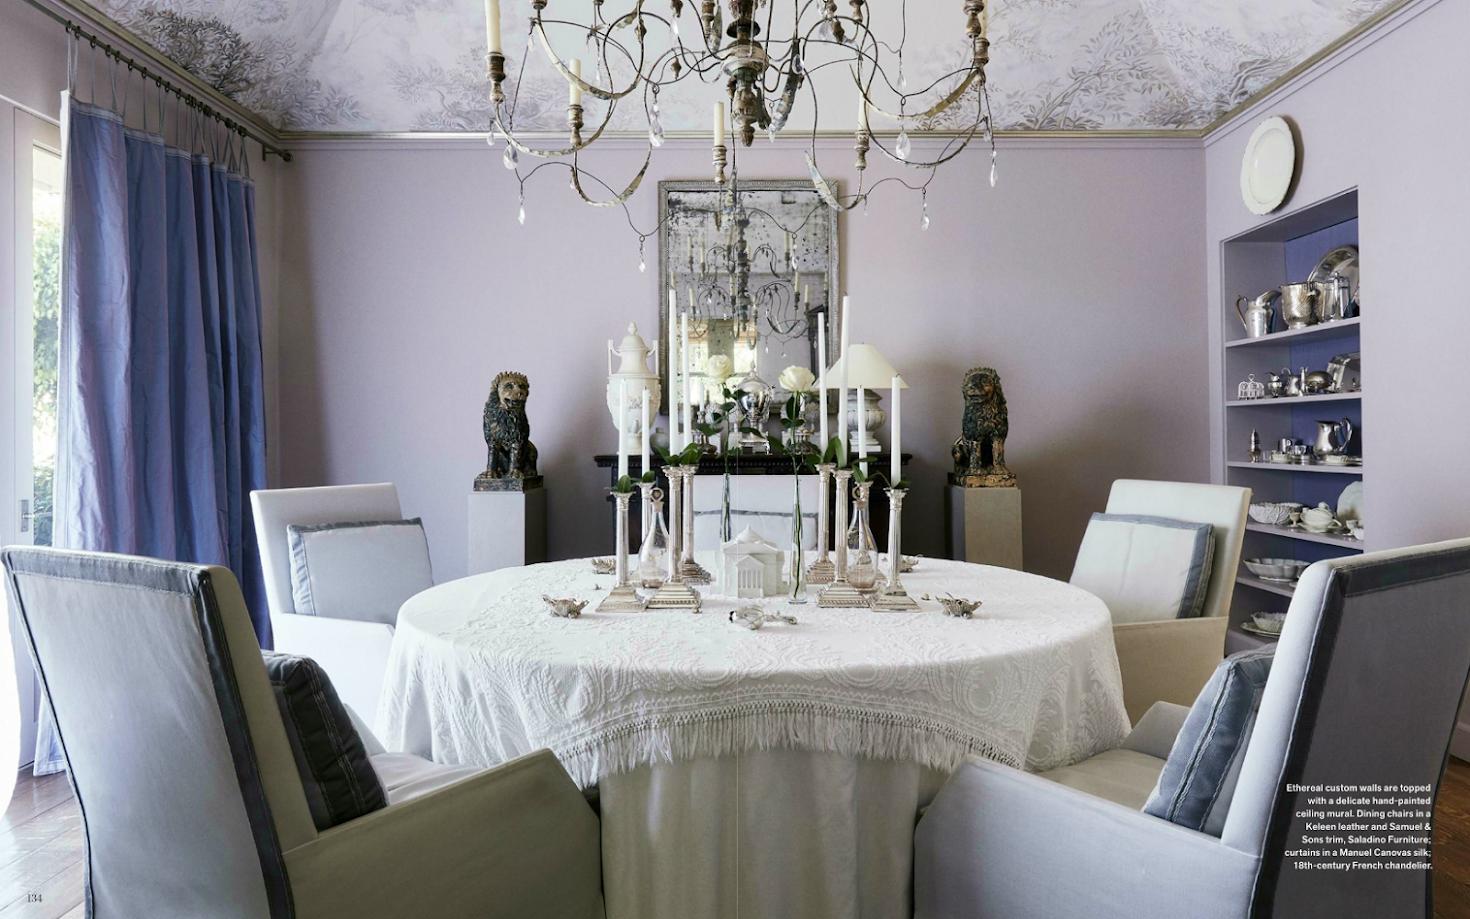 Cote de texas a great veranda - Veranda dining rooms ...